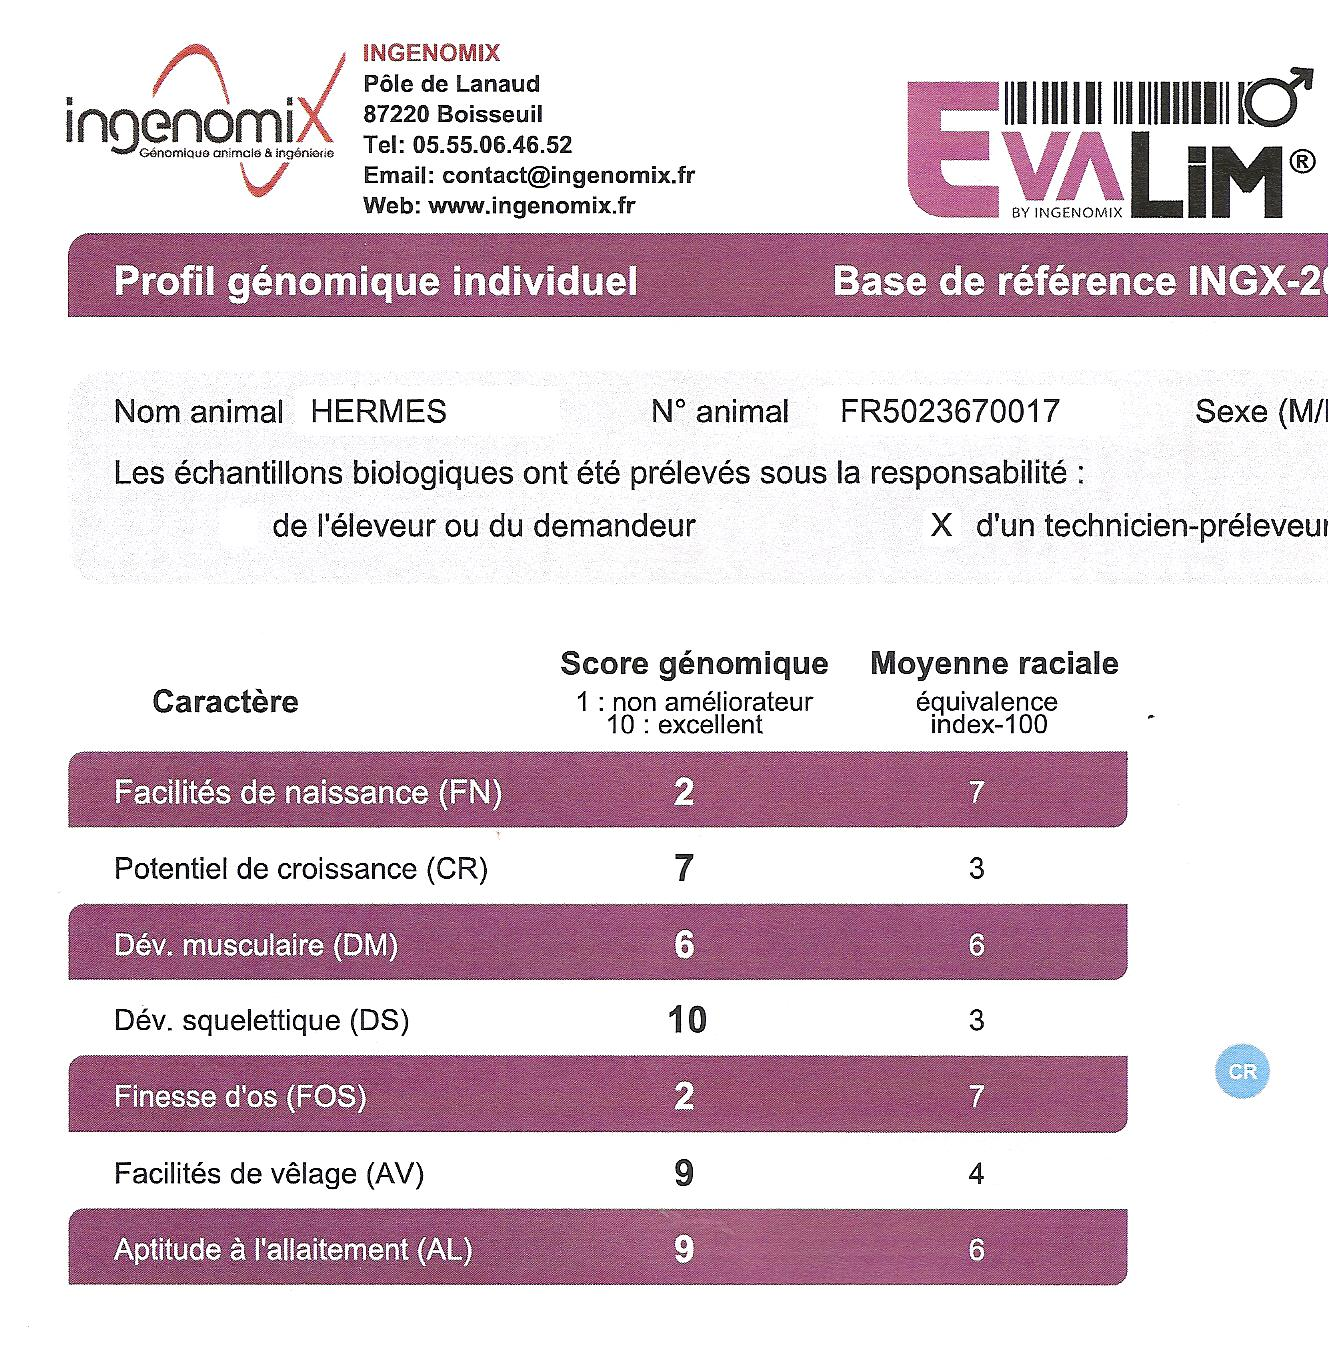 Genomie hermes 2